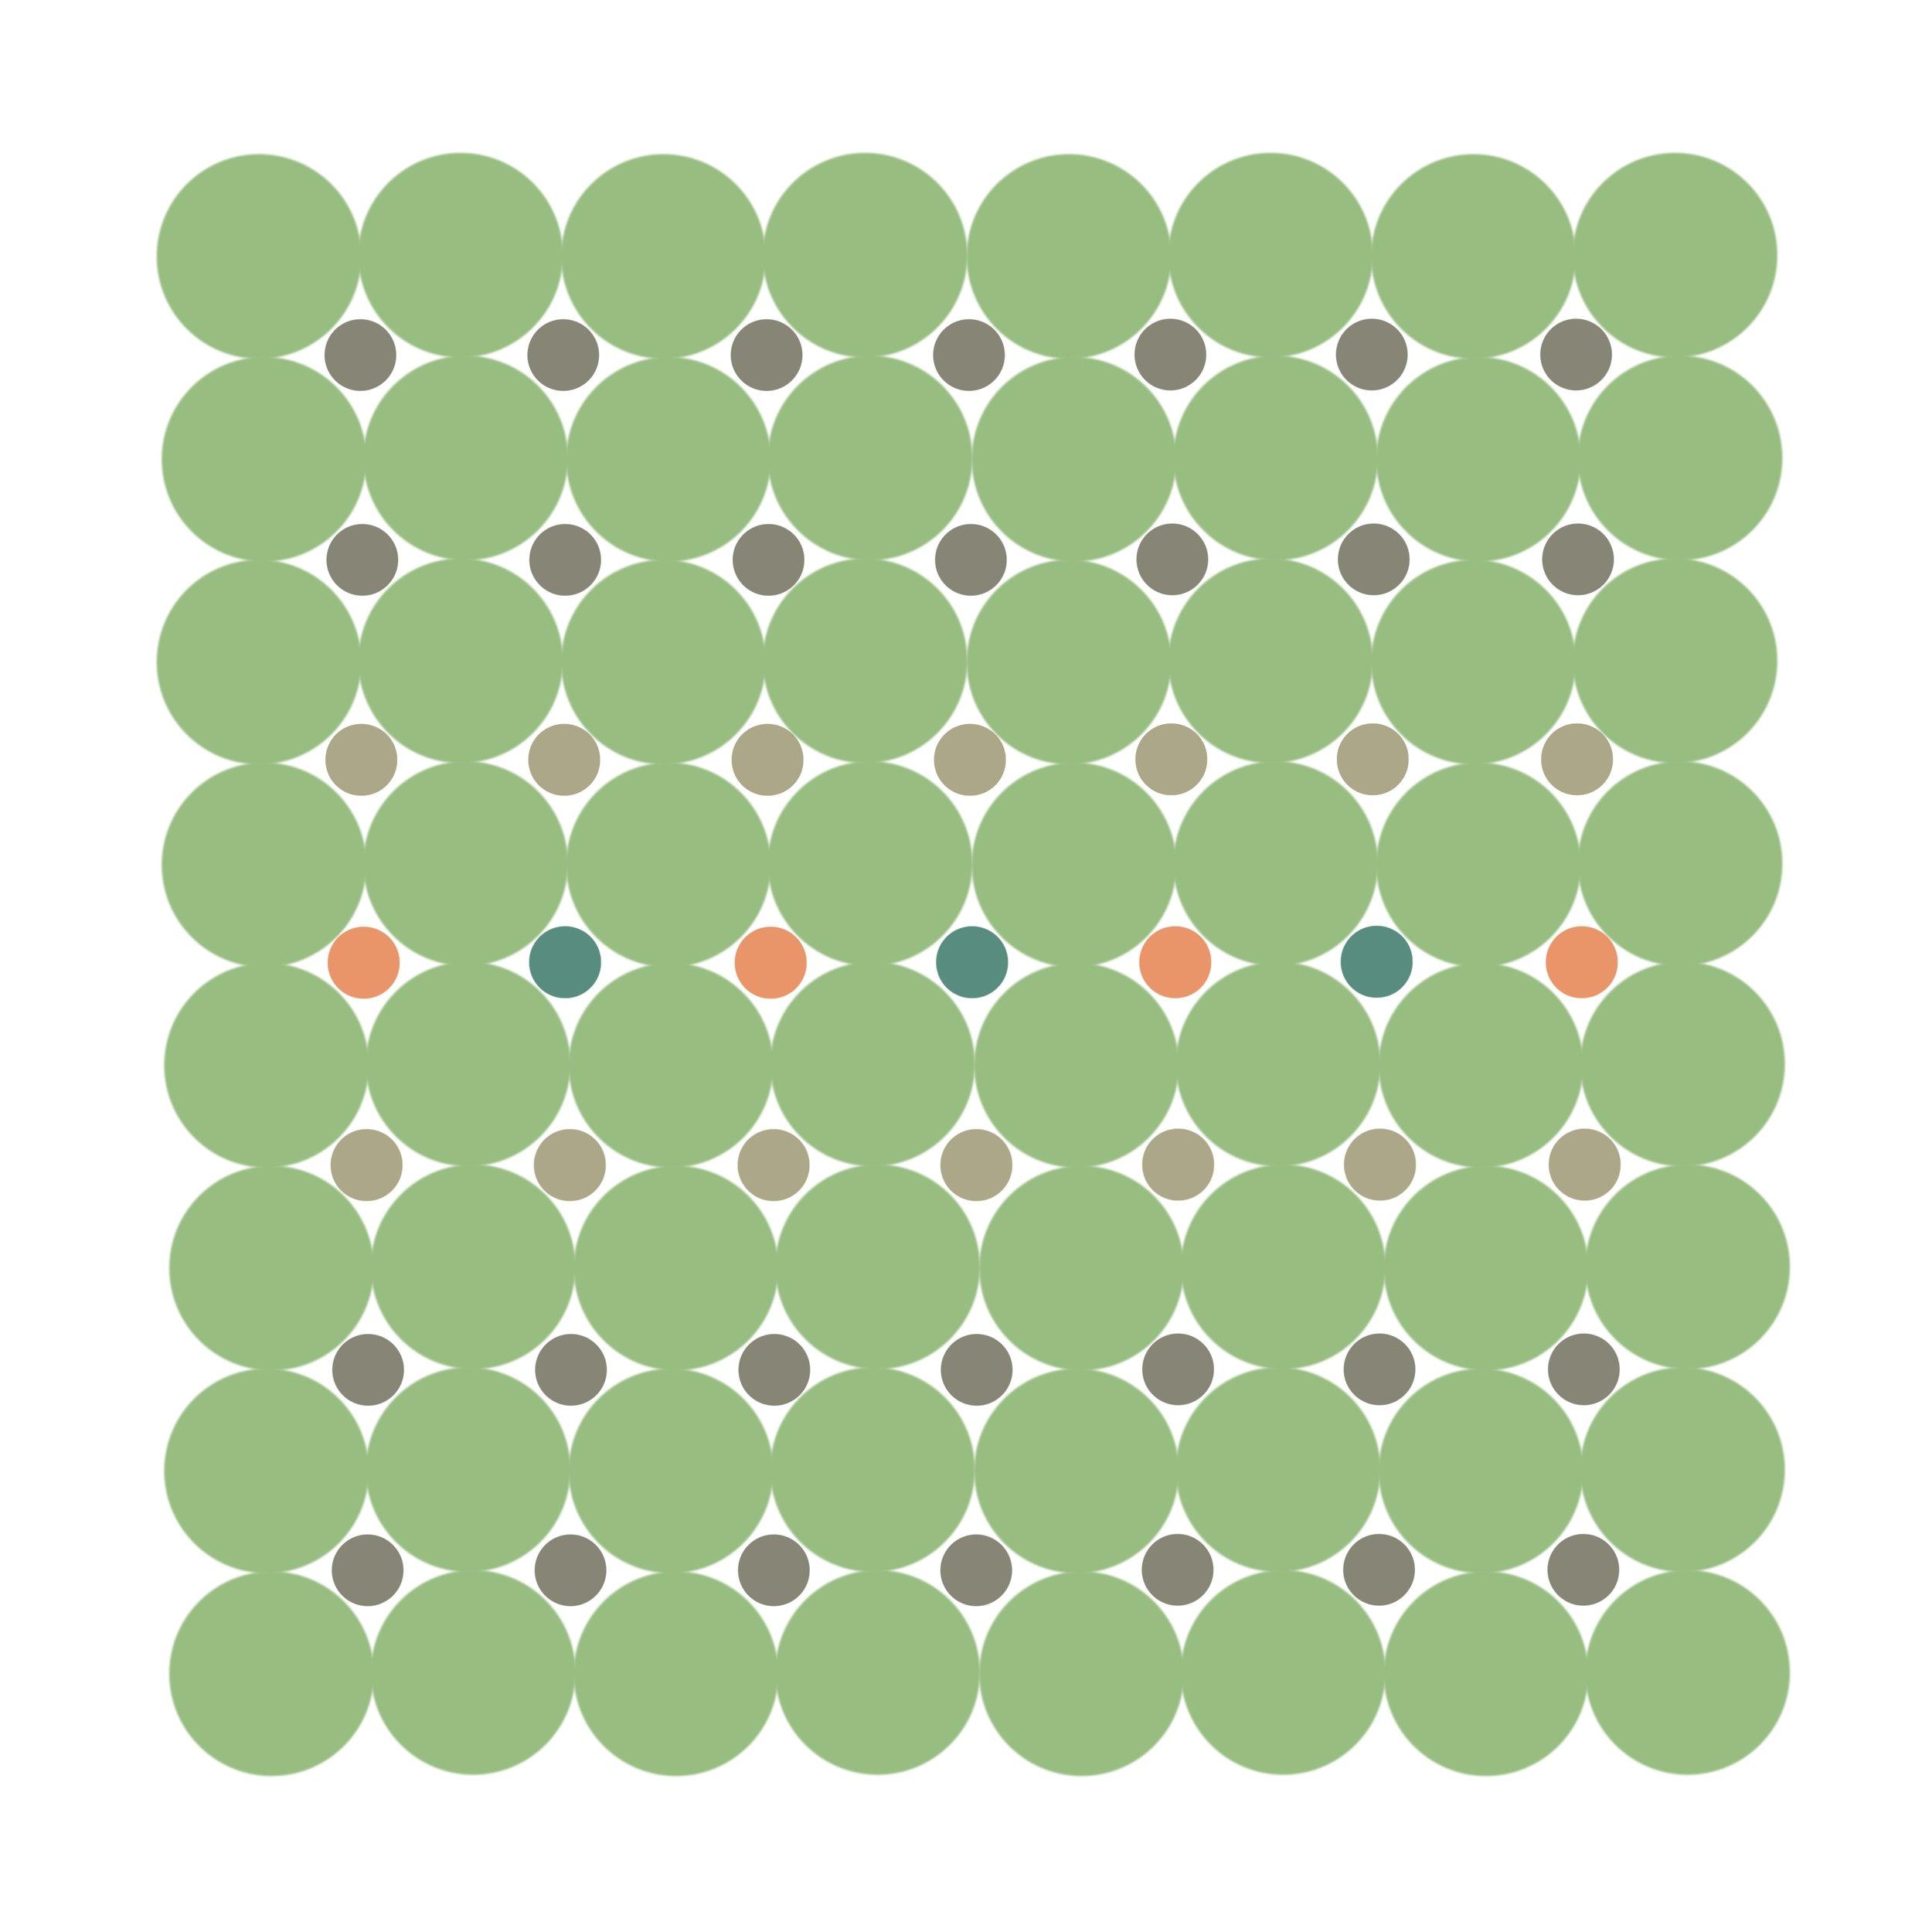 Dot Structure 10 - Seafoam Green